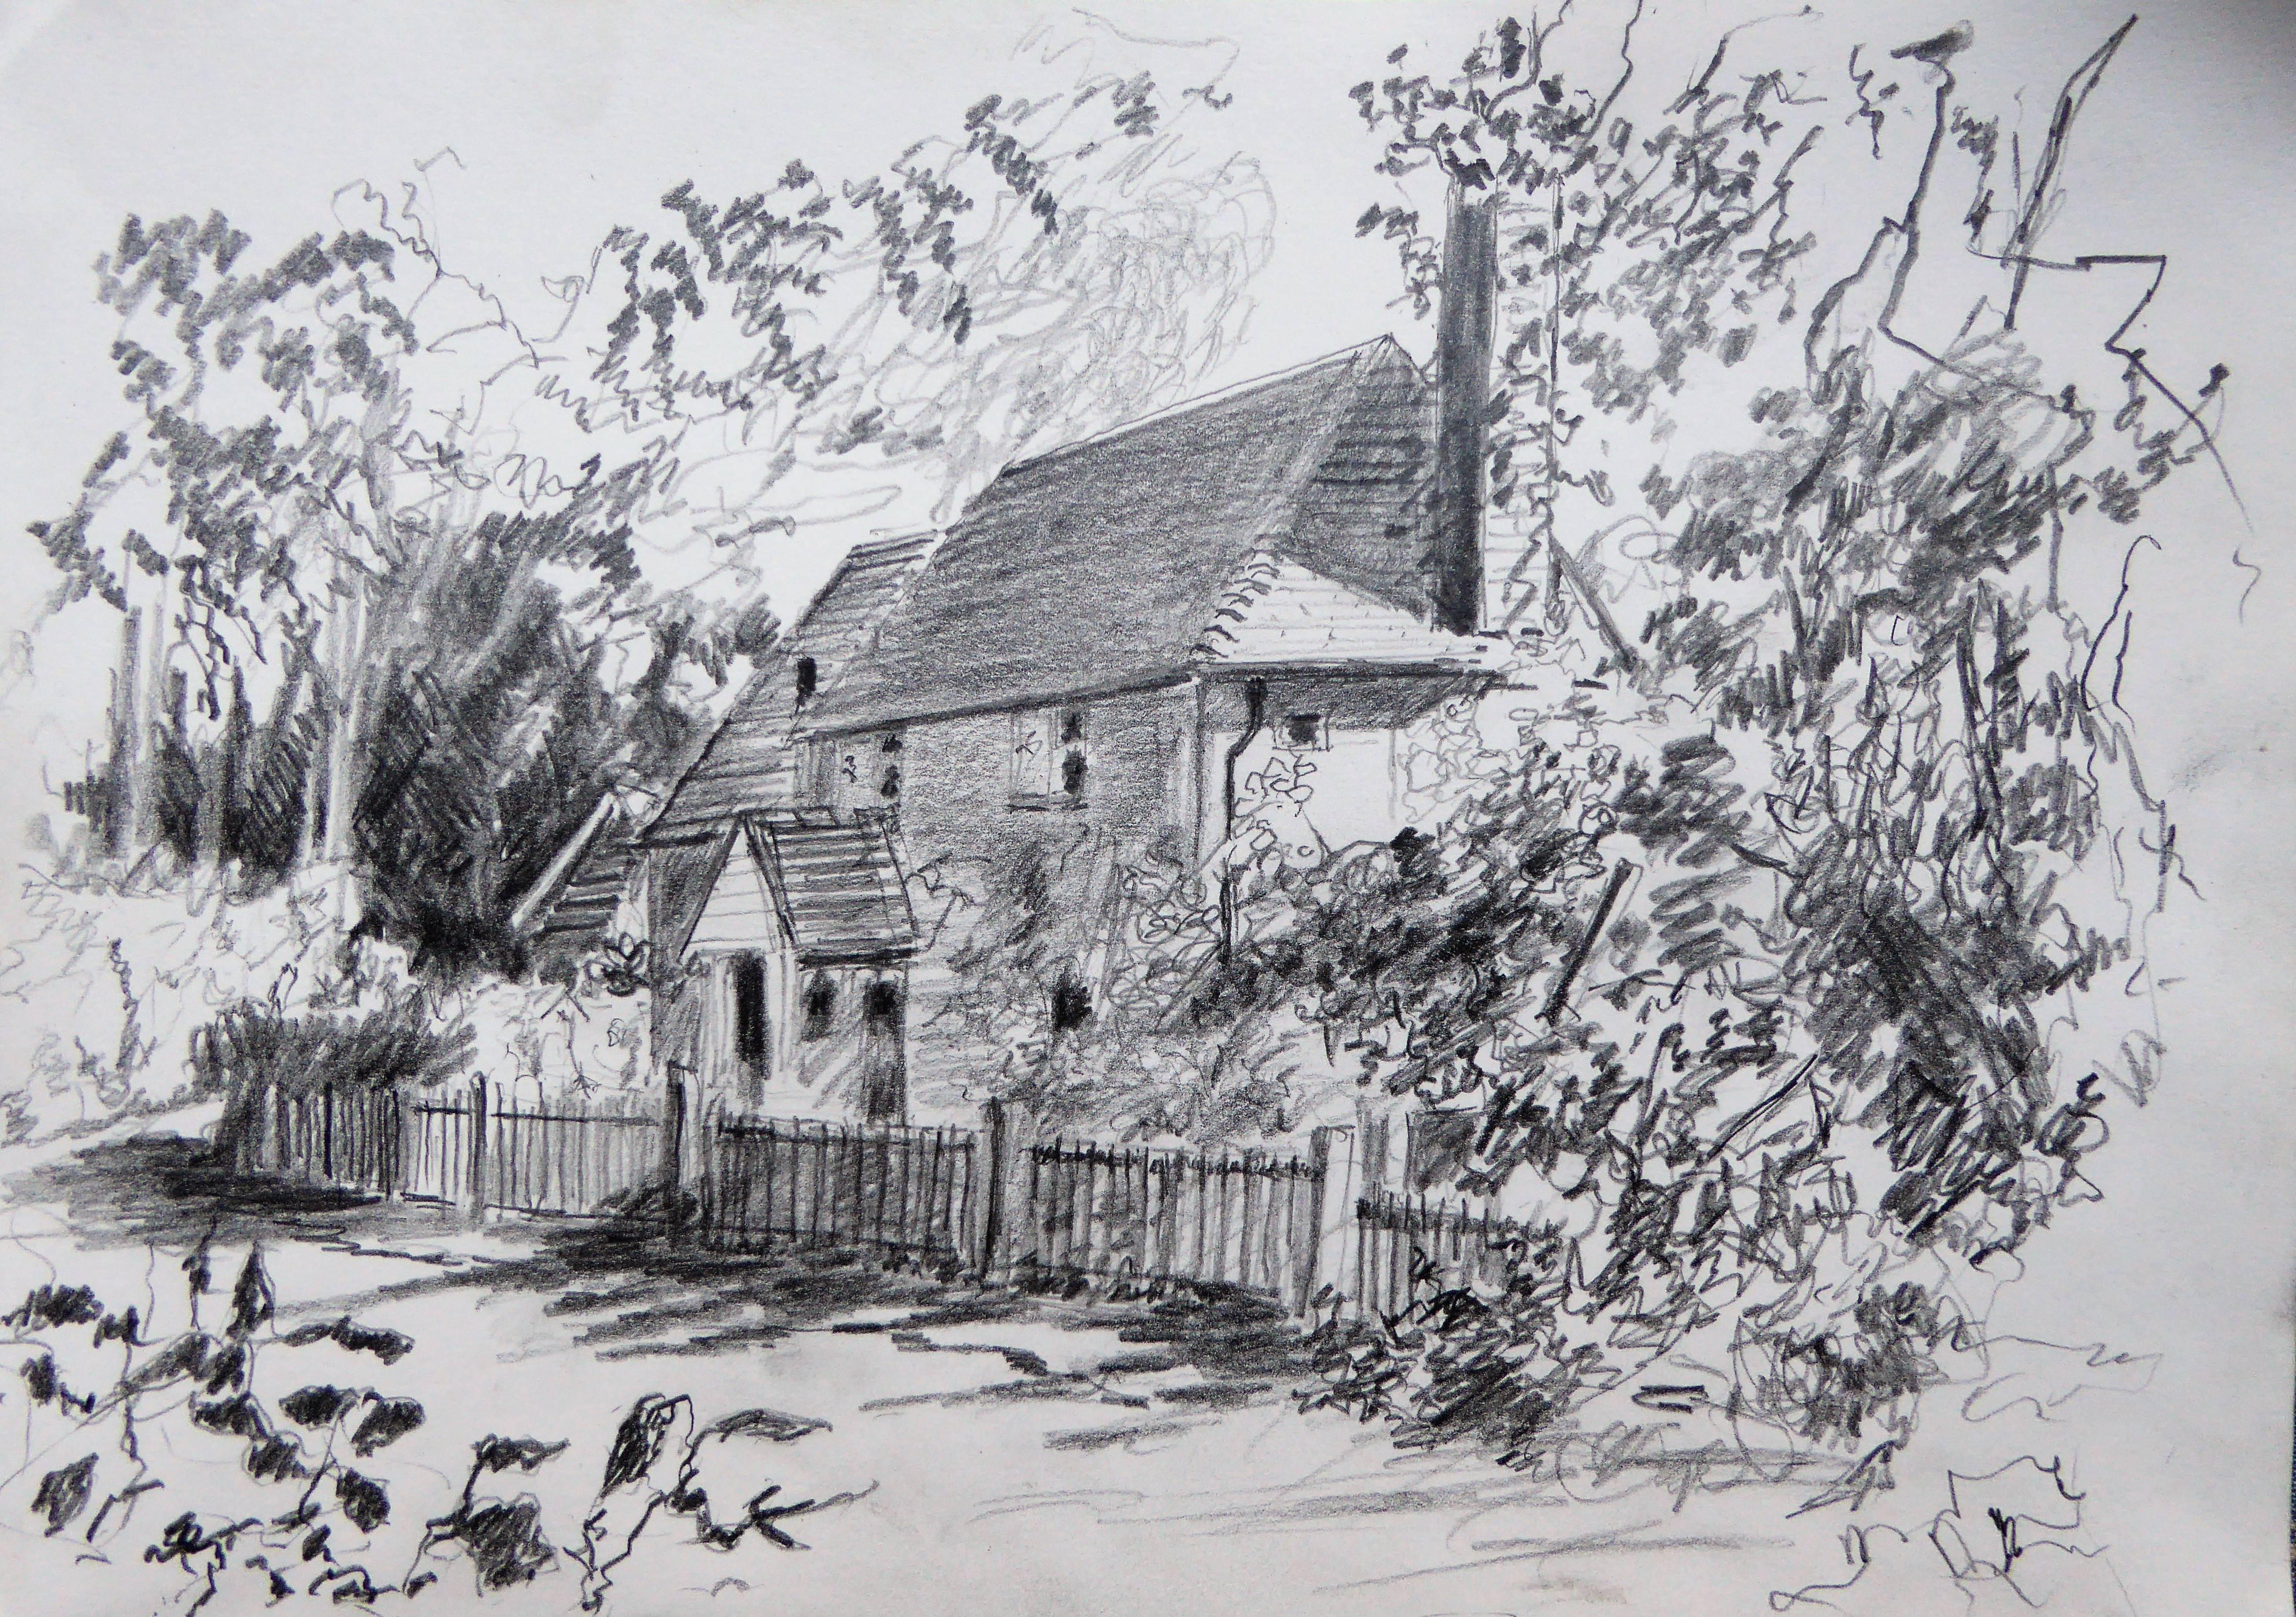 Yew tree Cottage, Friday Street